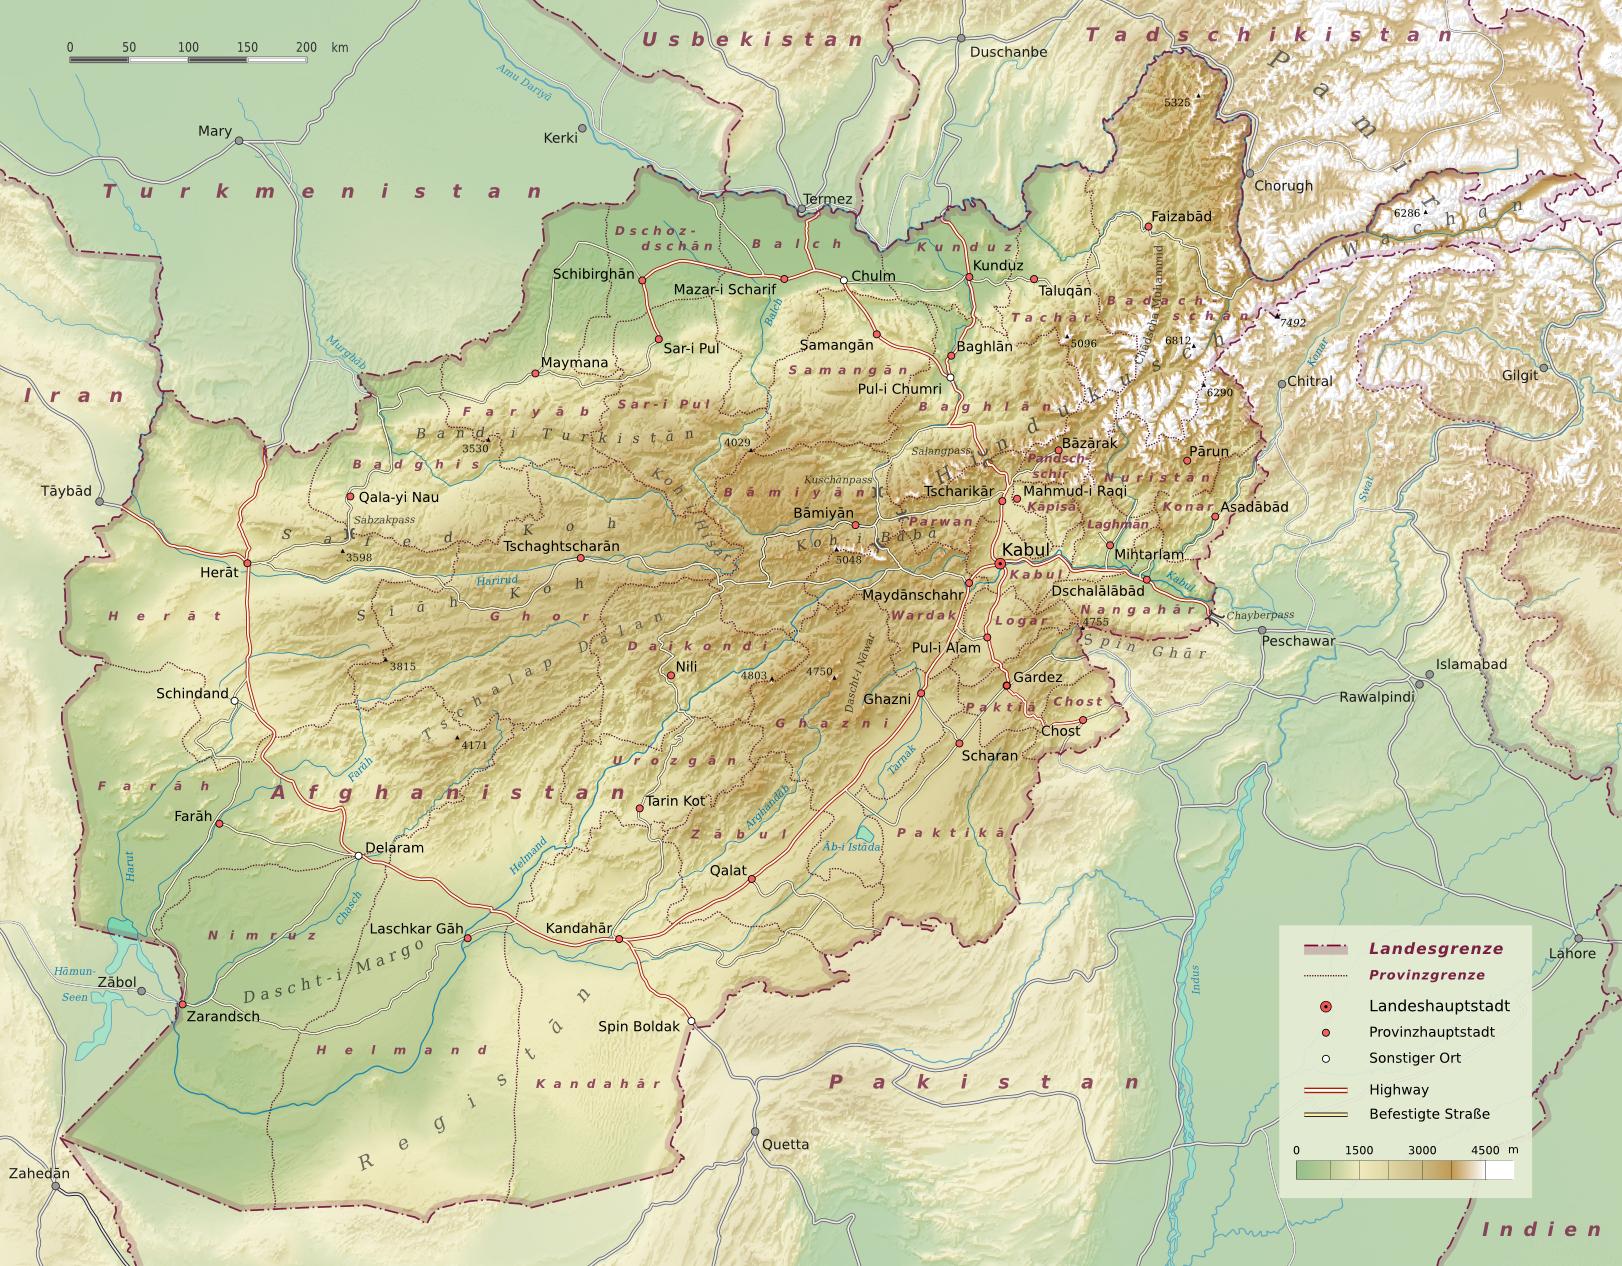 karte afghanistan Datei:Afghanistan physisch.png – Wikipedia karte afghanistan